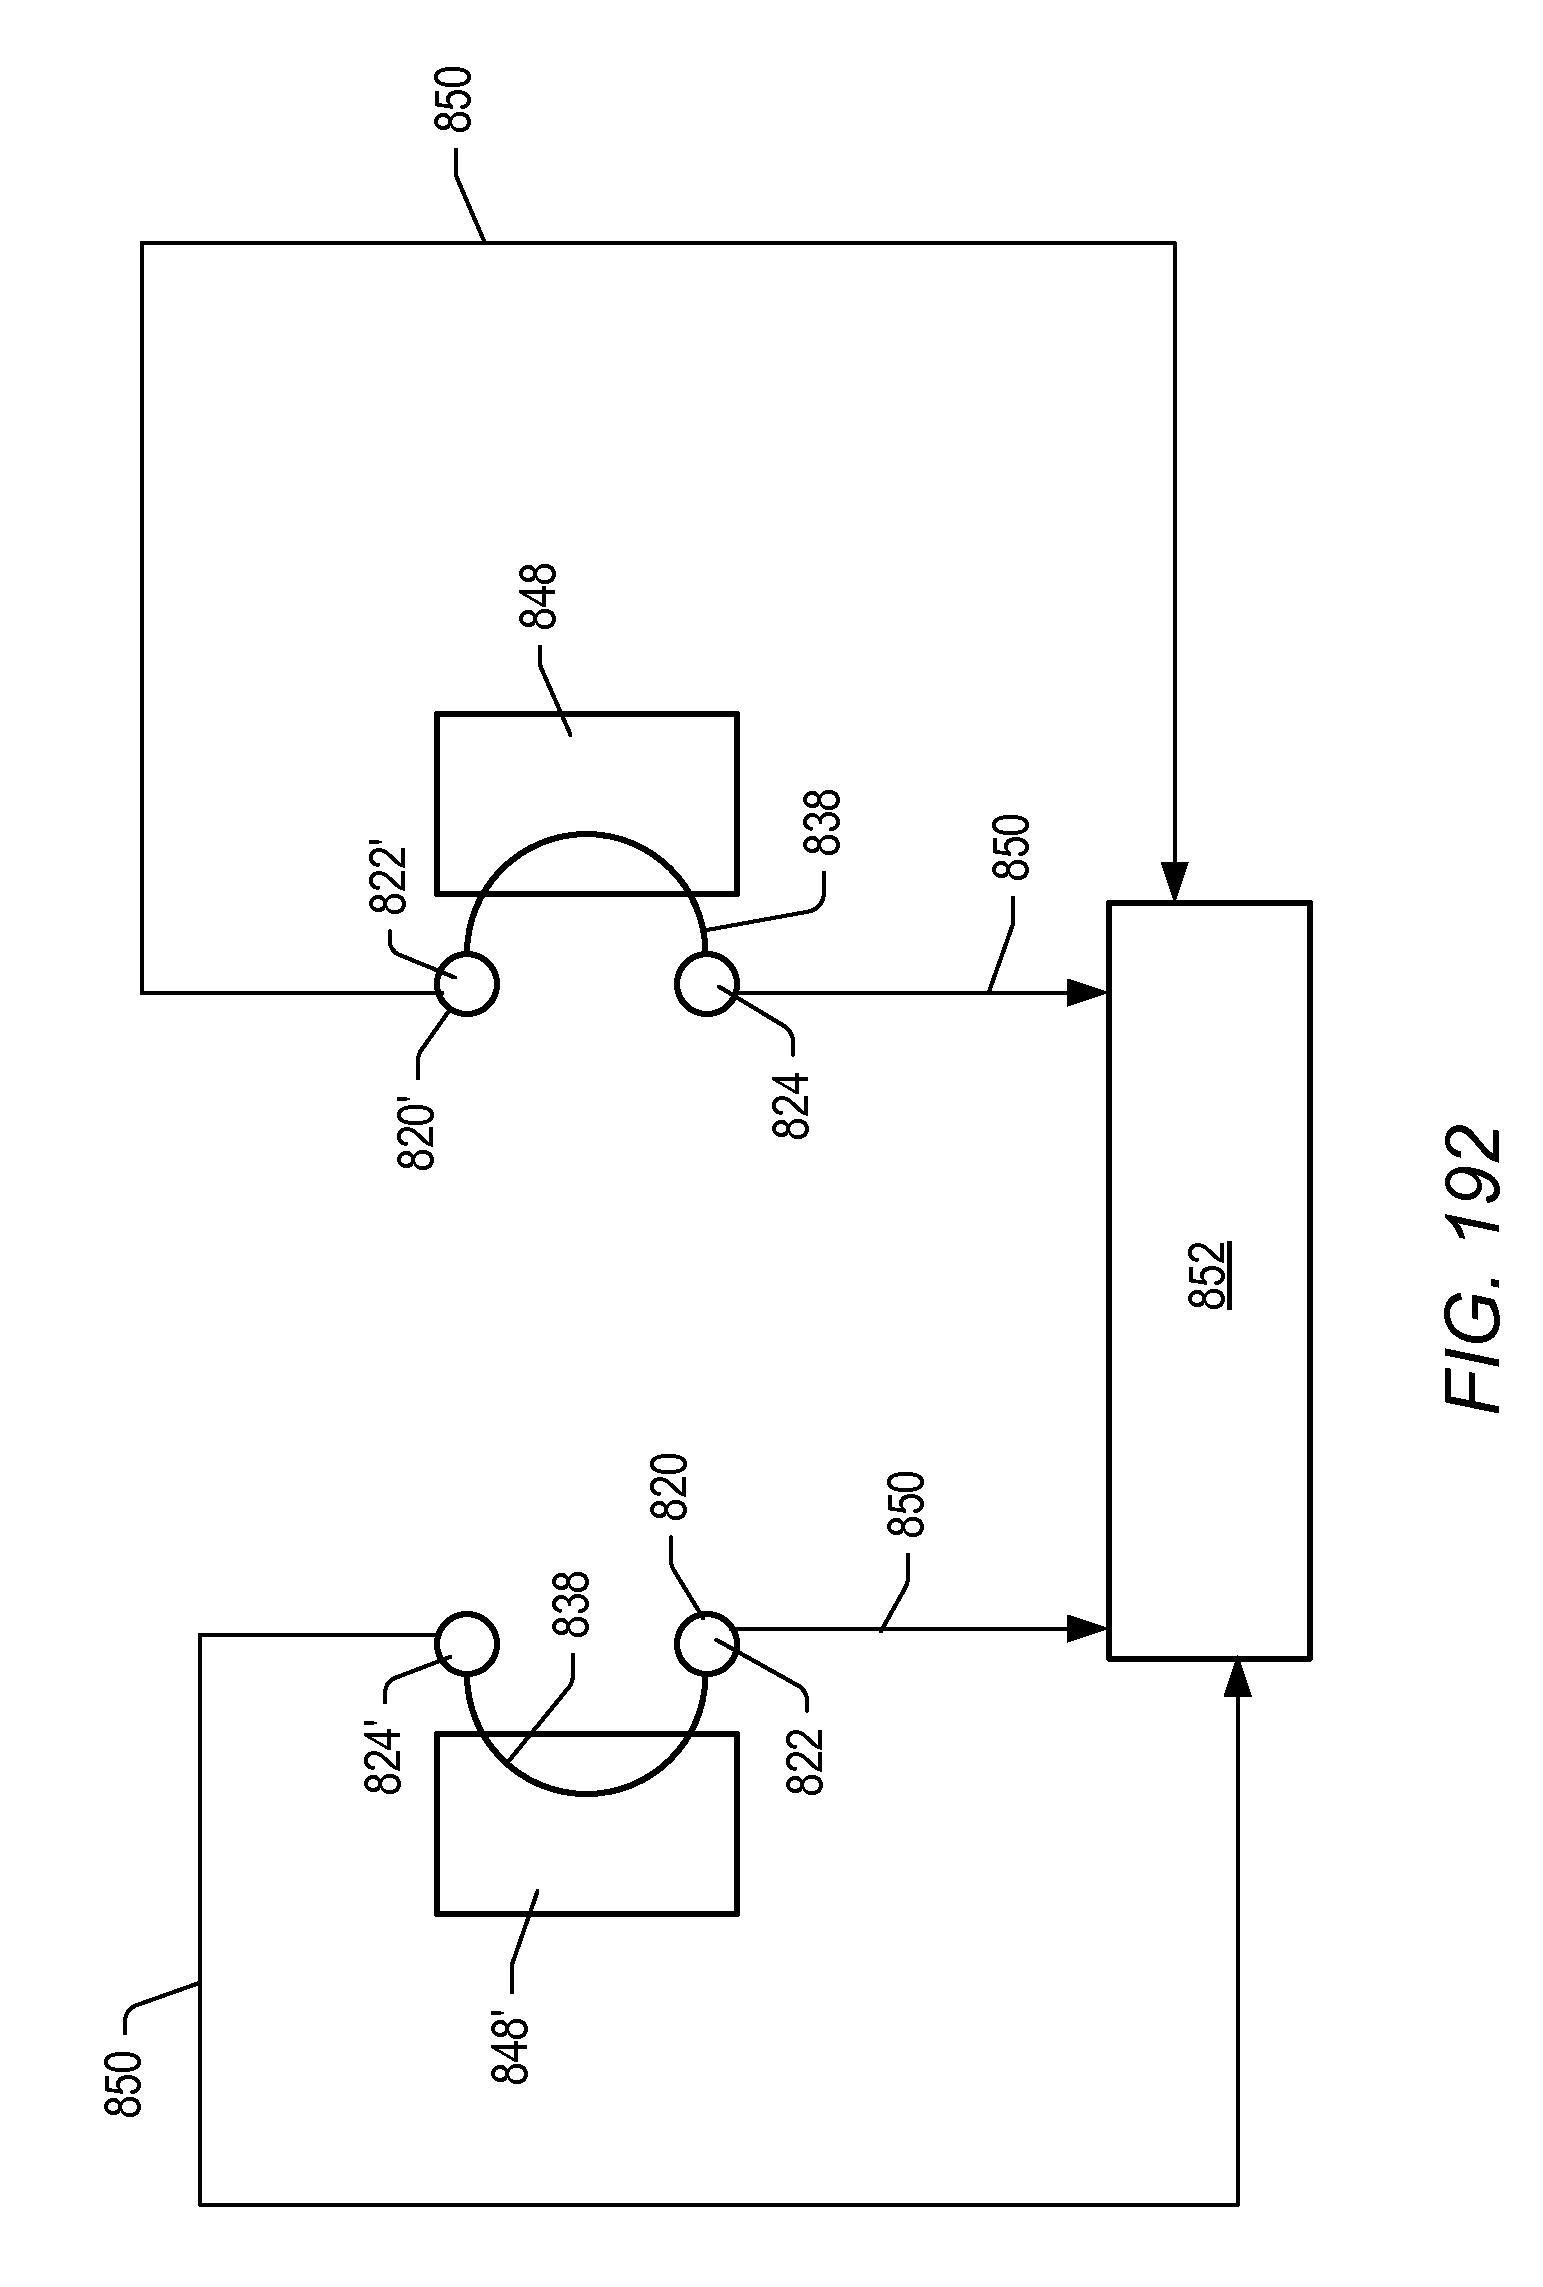 Patent Us 9528322 B2 Inertia Fuel Shut Off Switch On 2000 S10 Pump Wiring Diagram